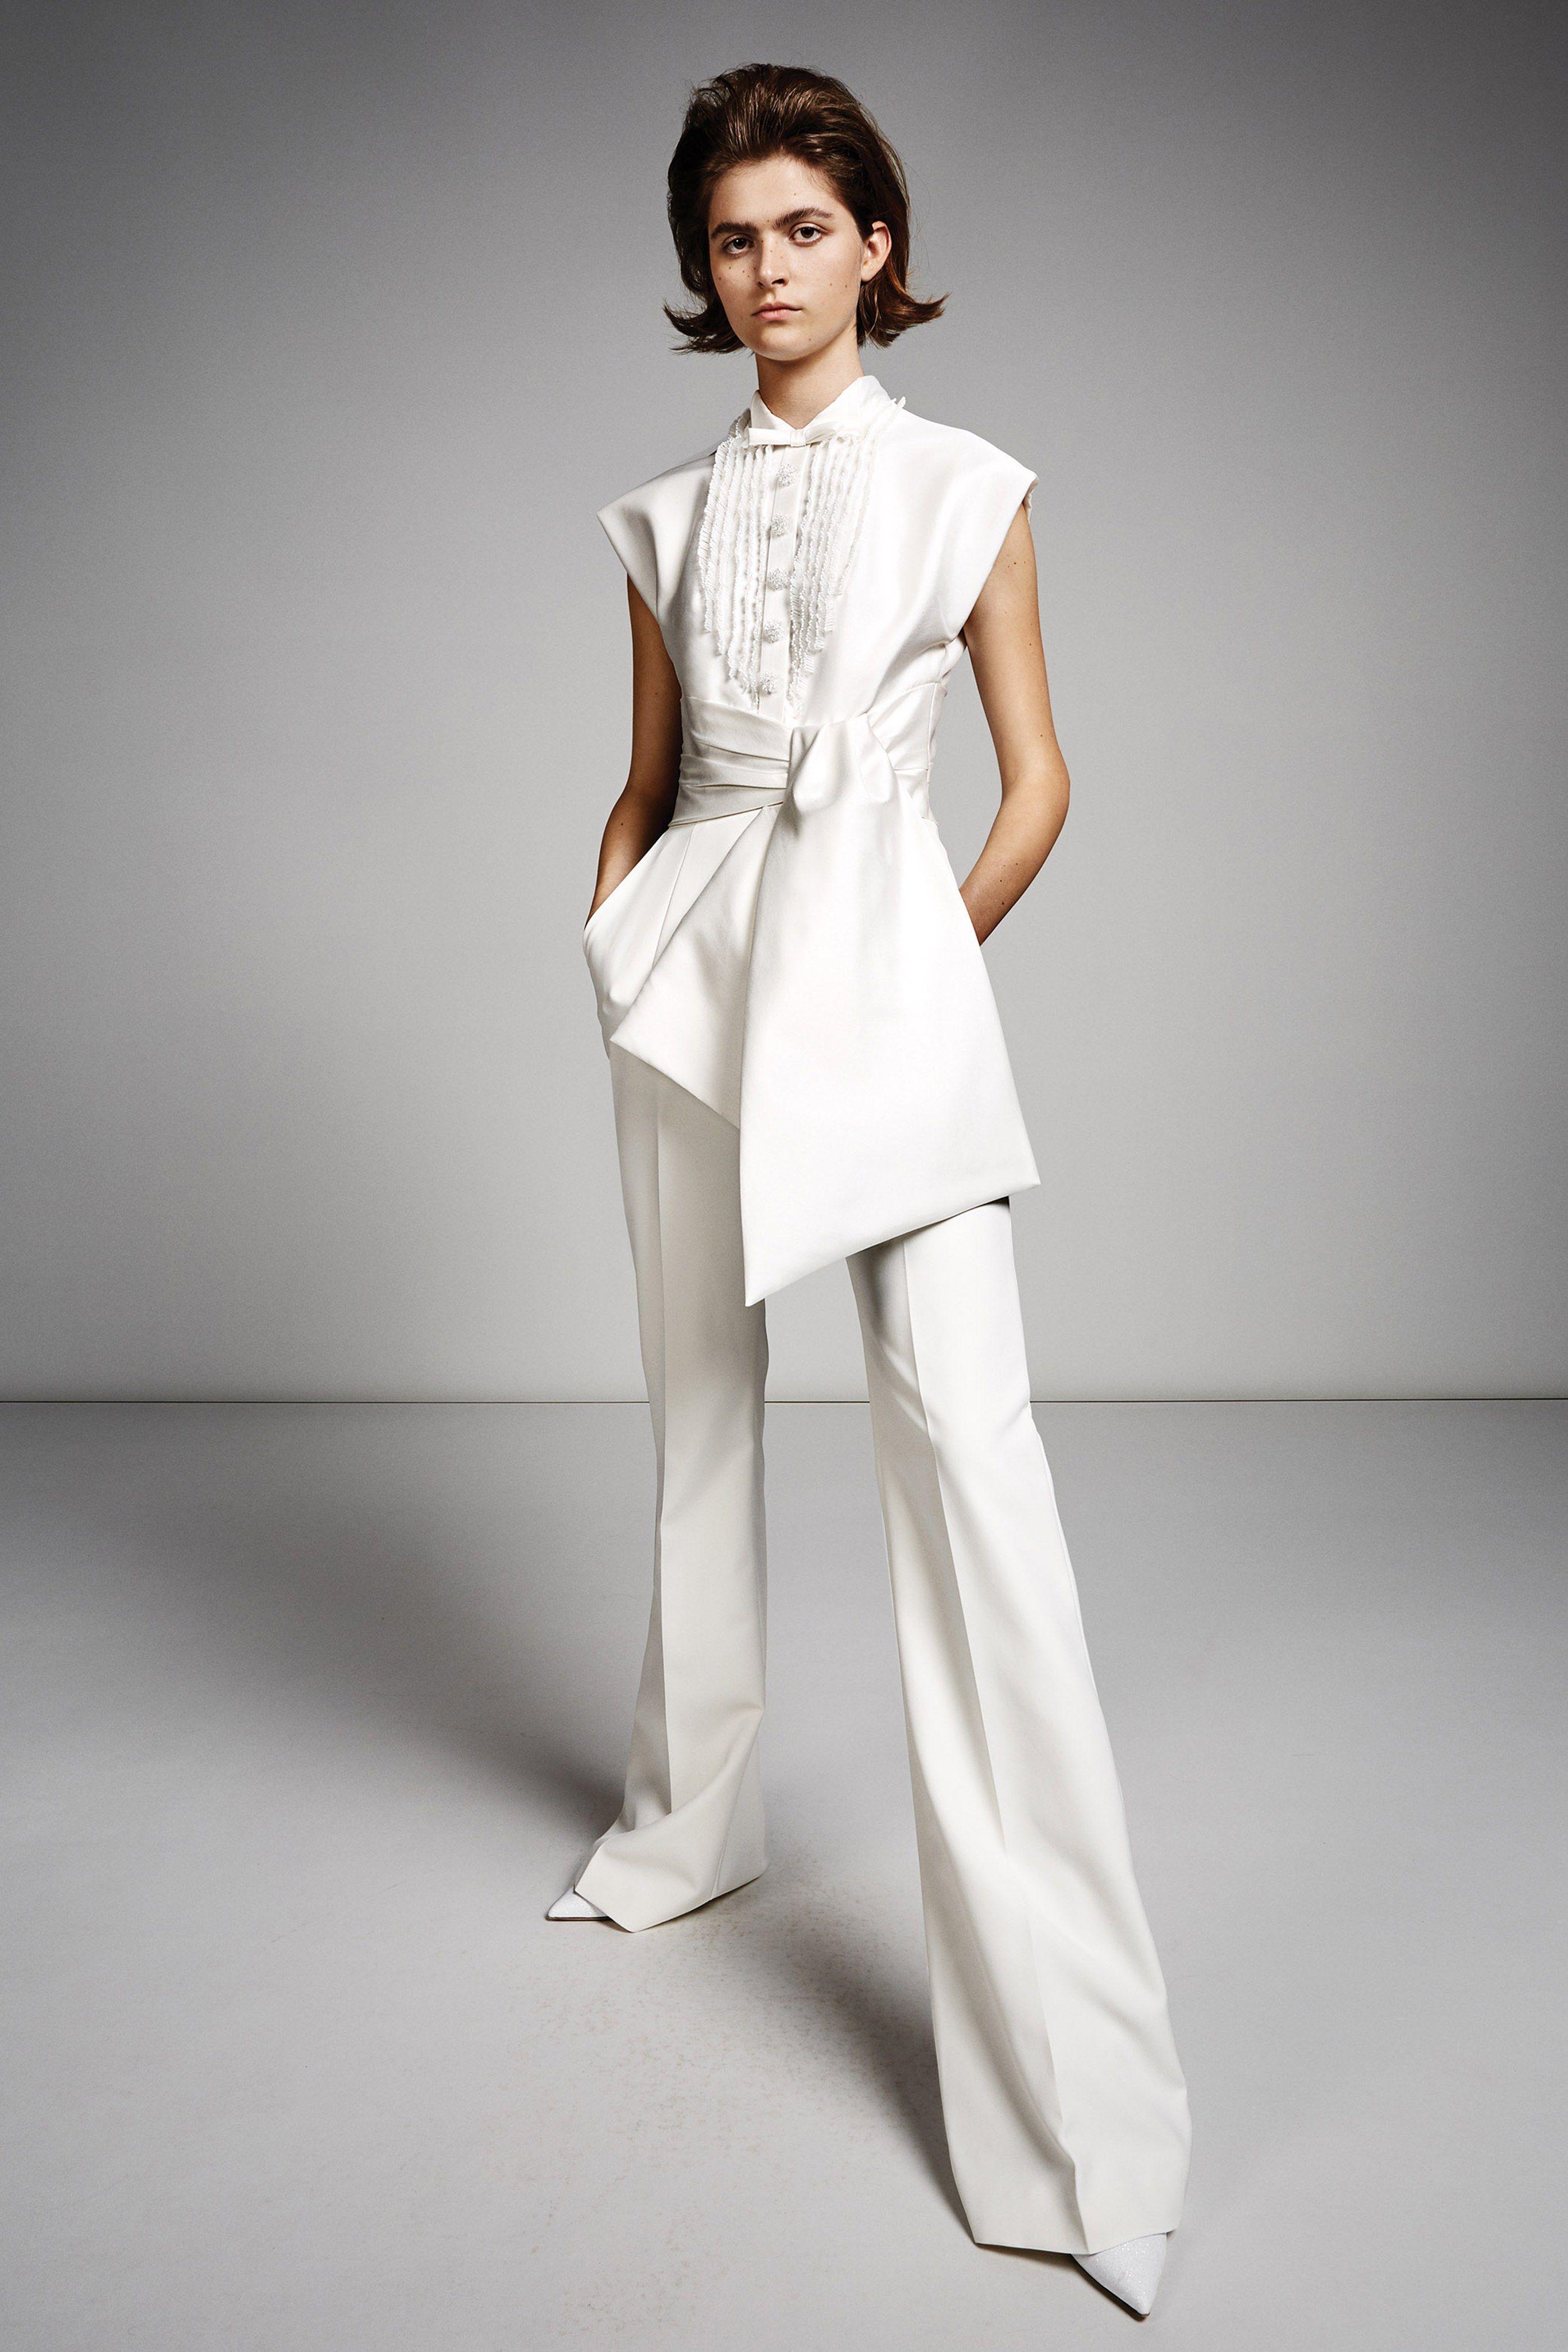 ffa94aa004 Viktor   Rolf Fall 2019 Bridal Collection - Vogue